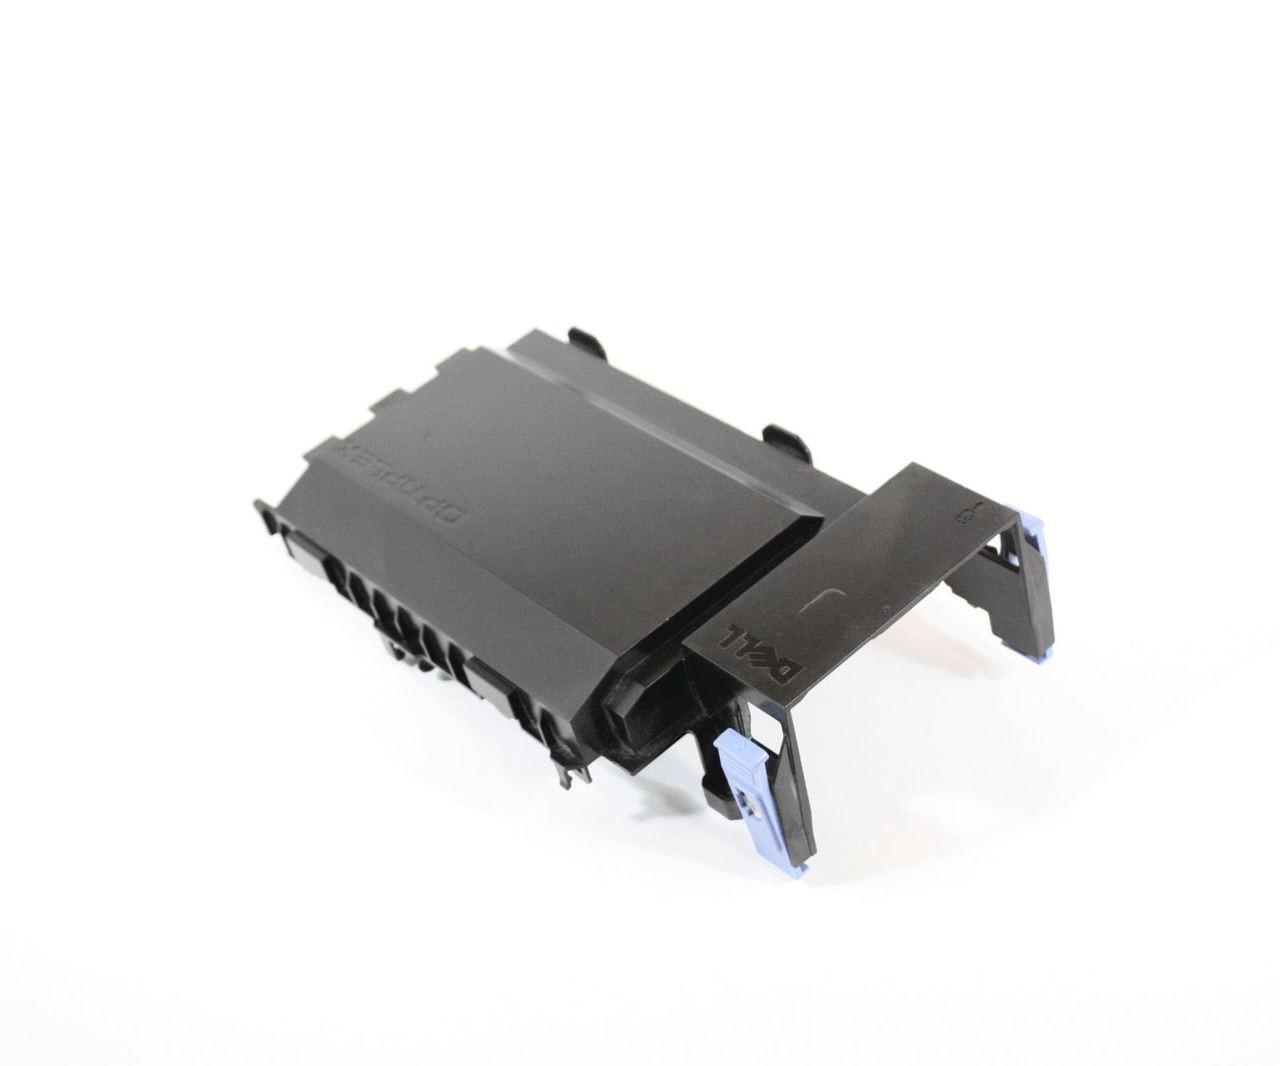 GENUINE Dell Optiplex 960 and Optiplex 980 SFF HD Hard Drive Caddy 0N915D 0R004D